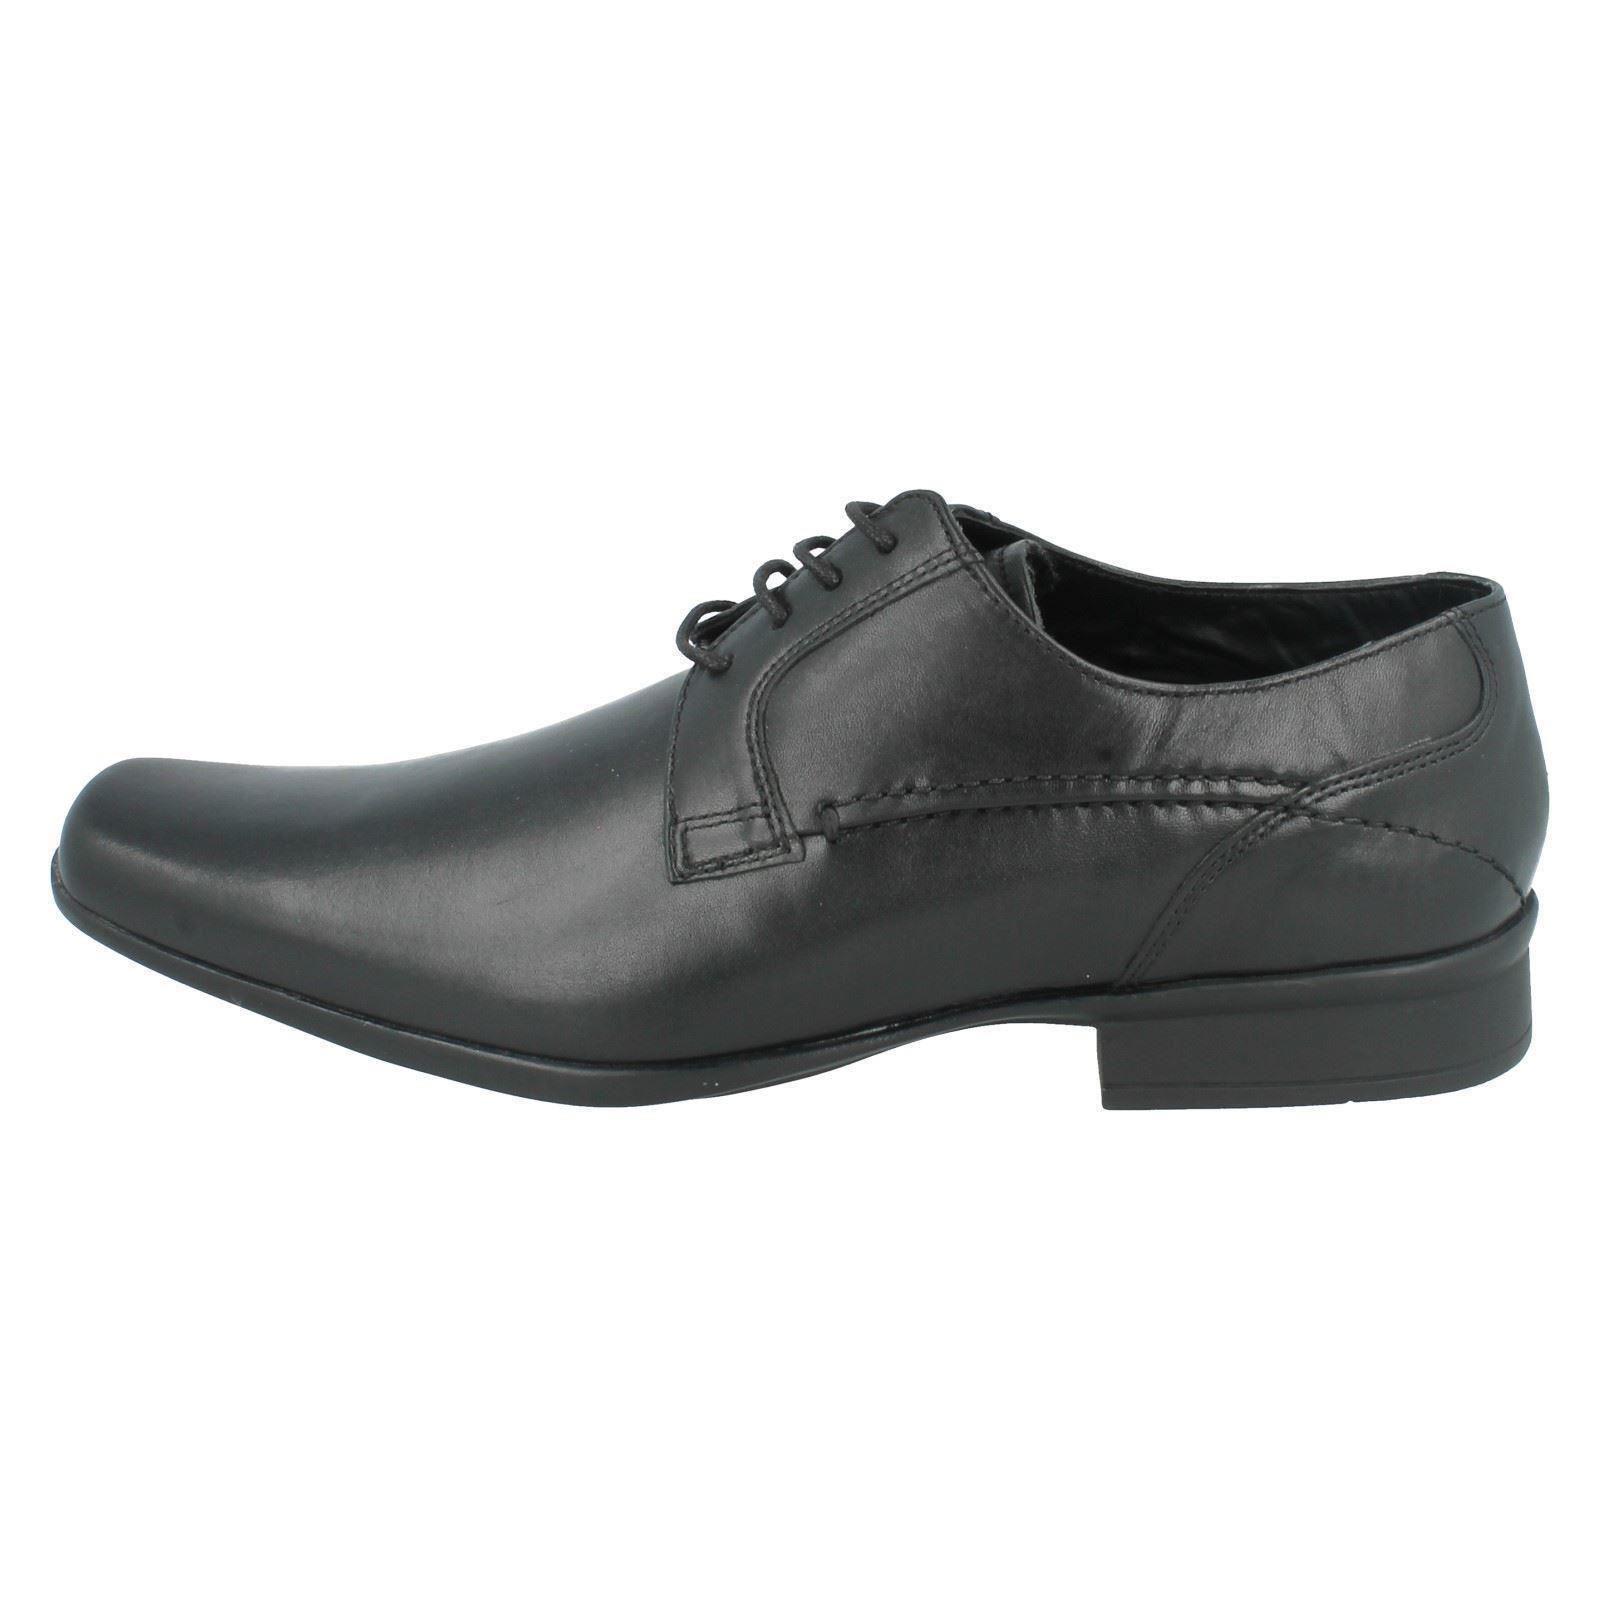 Men's Schuhes Clarks Formal Lace Up Schuhes Men's Style - Ascar Walk f3526c